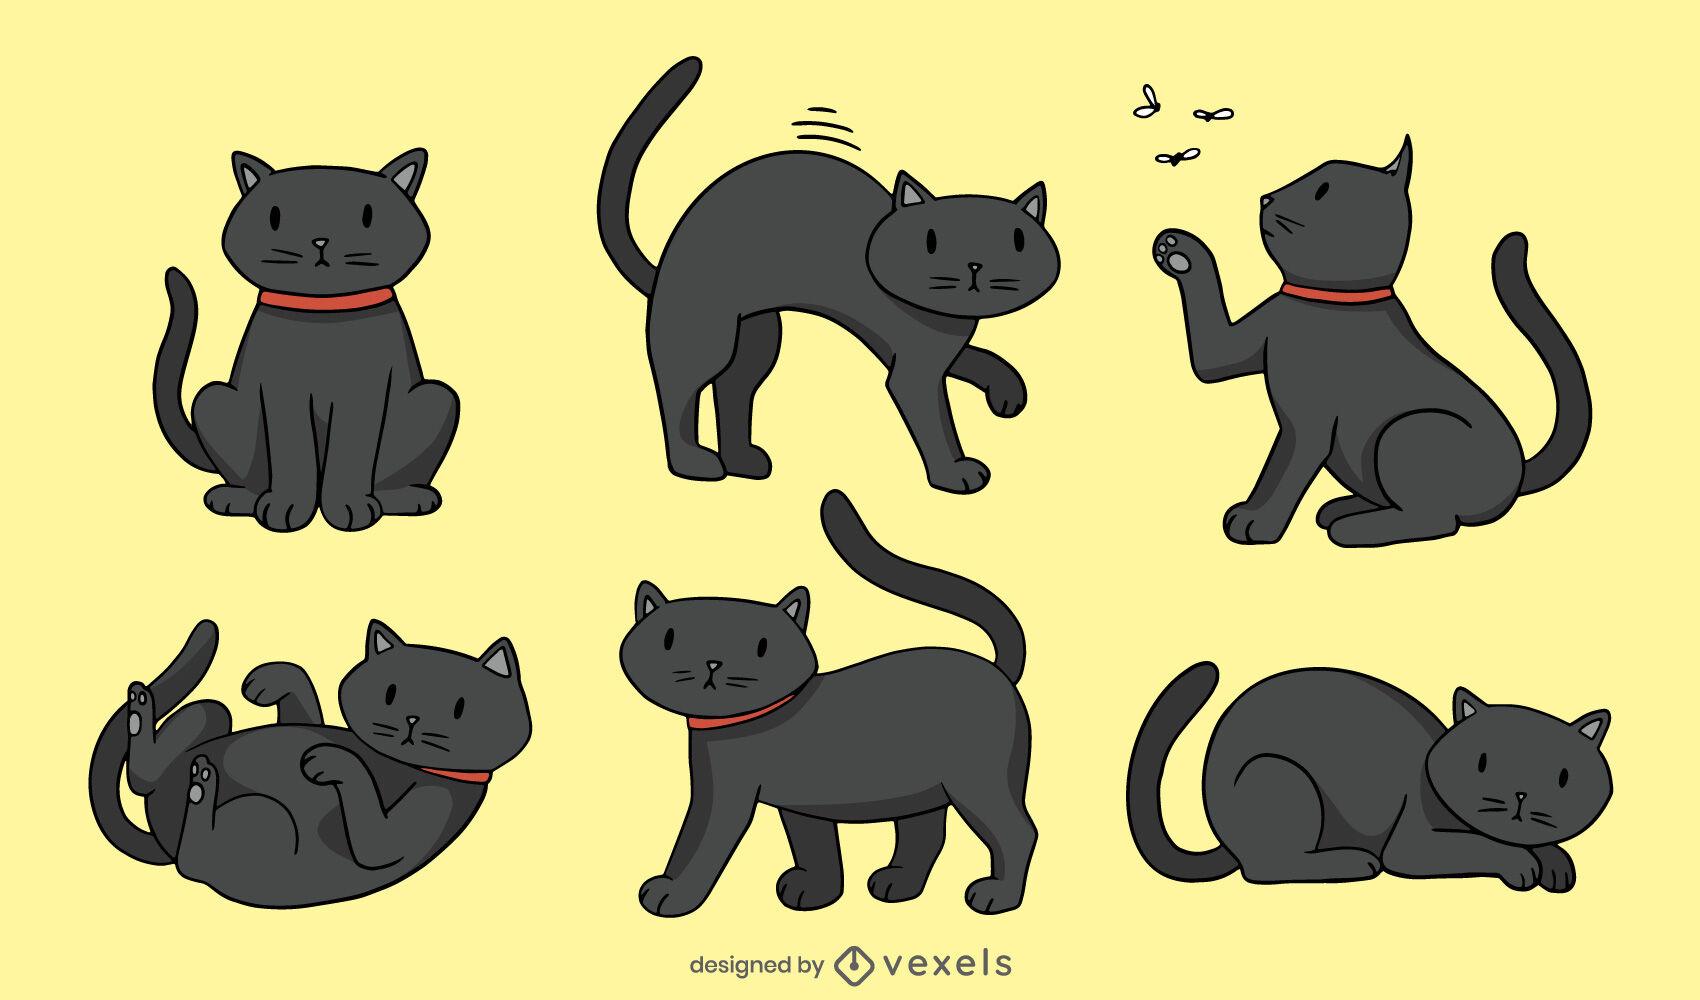 Conjunto de ilustra?es de gato preto fofo